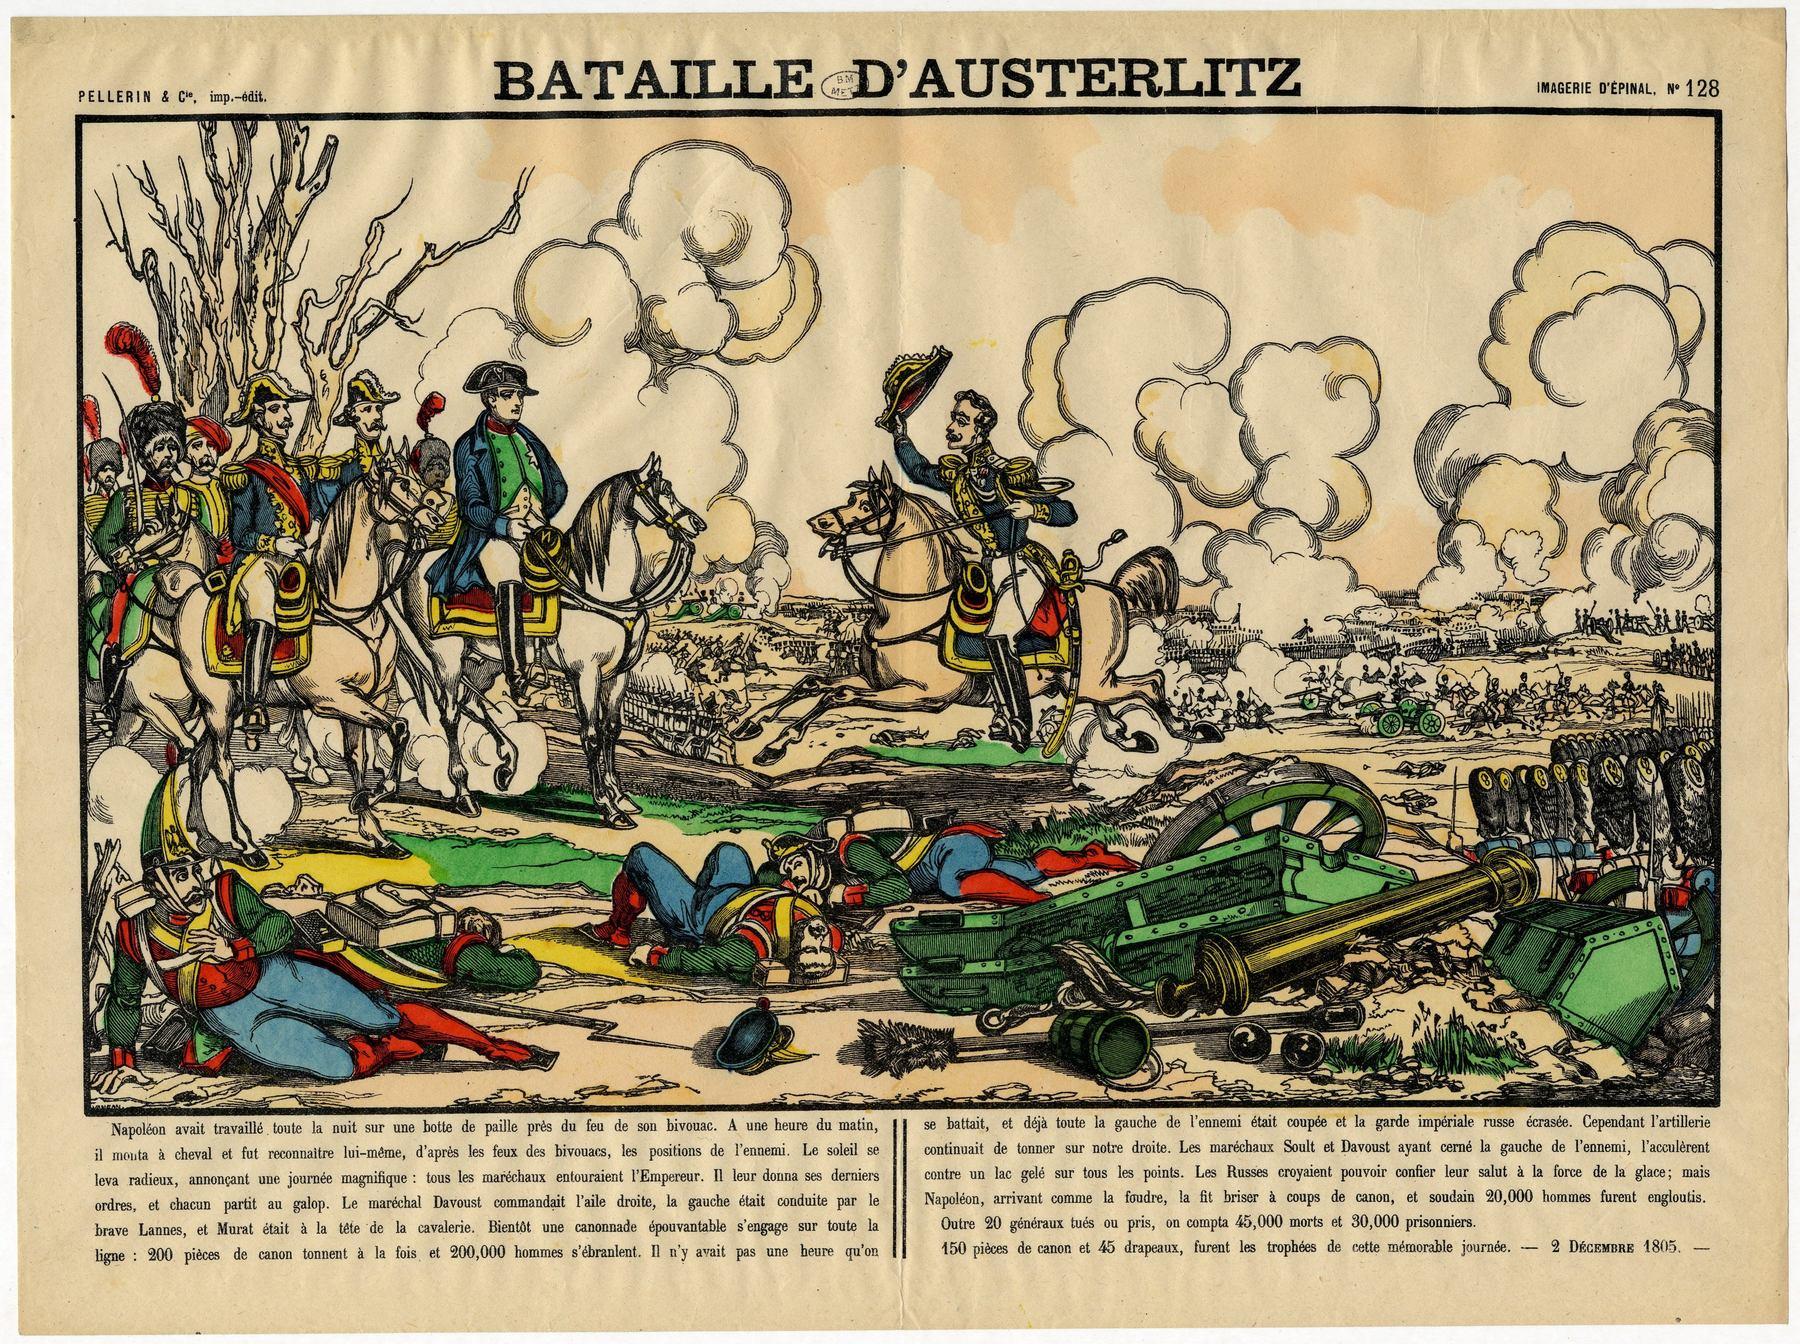 Contenu du Bataille d'Austerlitz